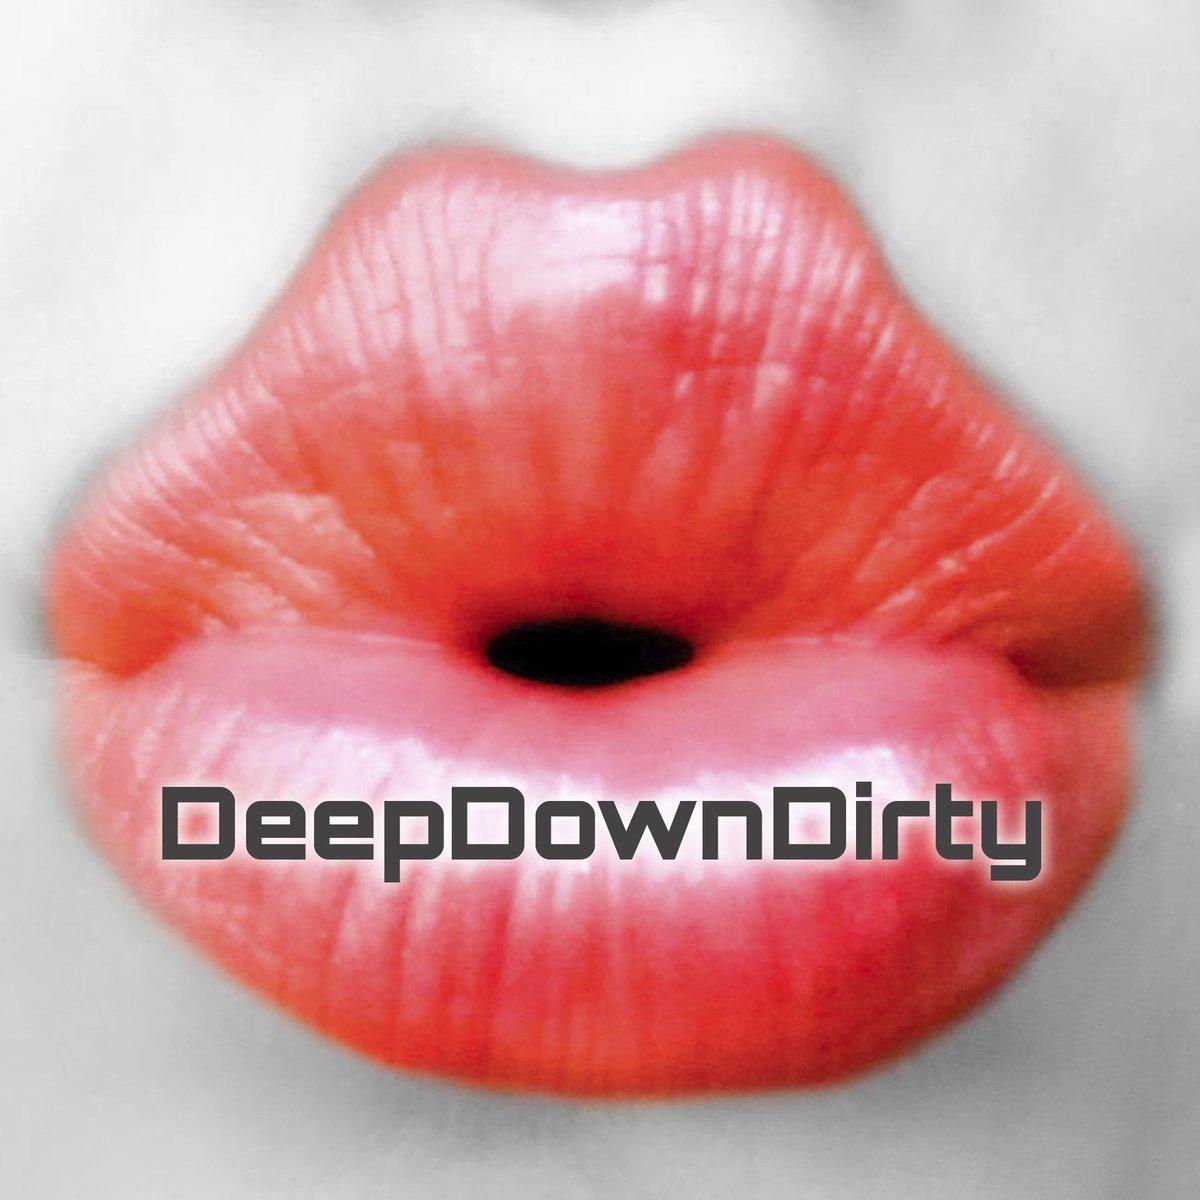 Love #Housemusic?  Check out @DeepDownDirtyRL&#39;s @YouTube #Playlist  http:// zurl.co/ZONJ  &nbsp;   #Deep #Tech #Progressive #Underground #Vocal <br>http://pic.twitter.com/Em07MJz6qx